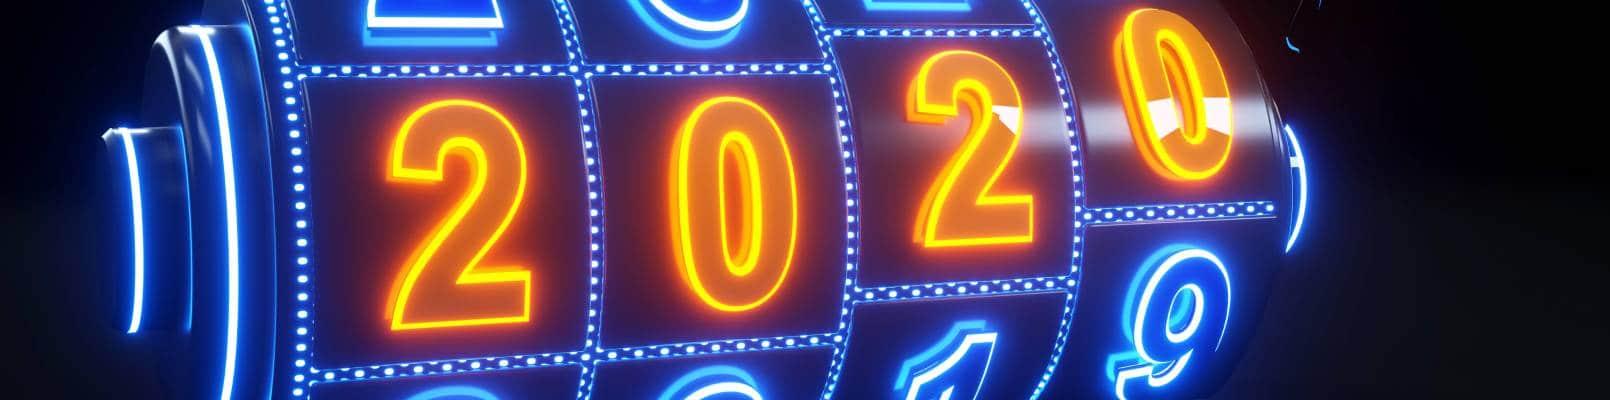 pasi alegere cazinouri noi online